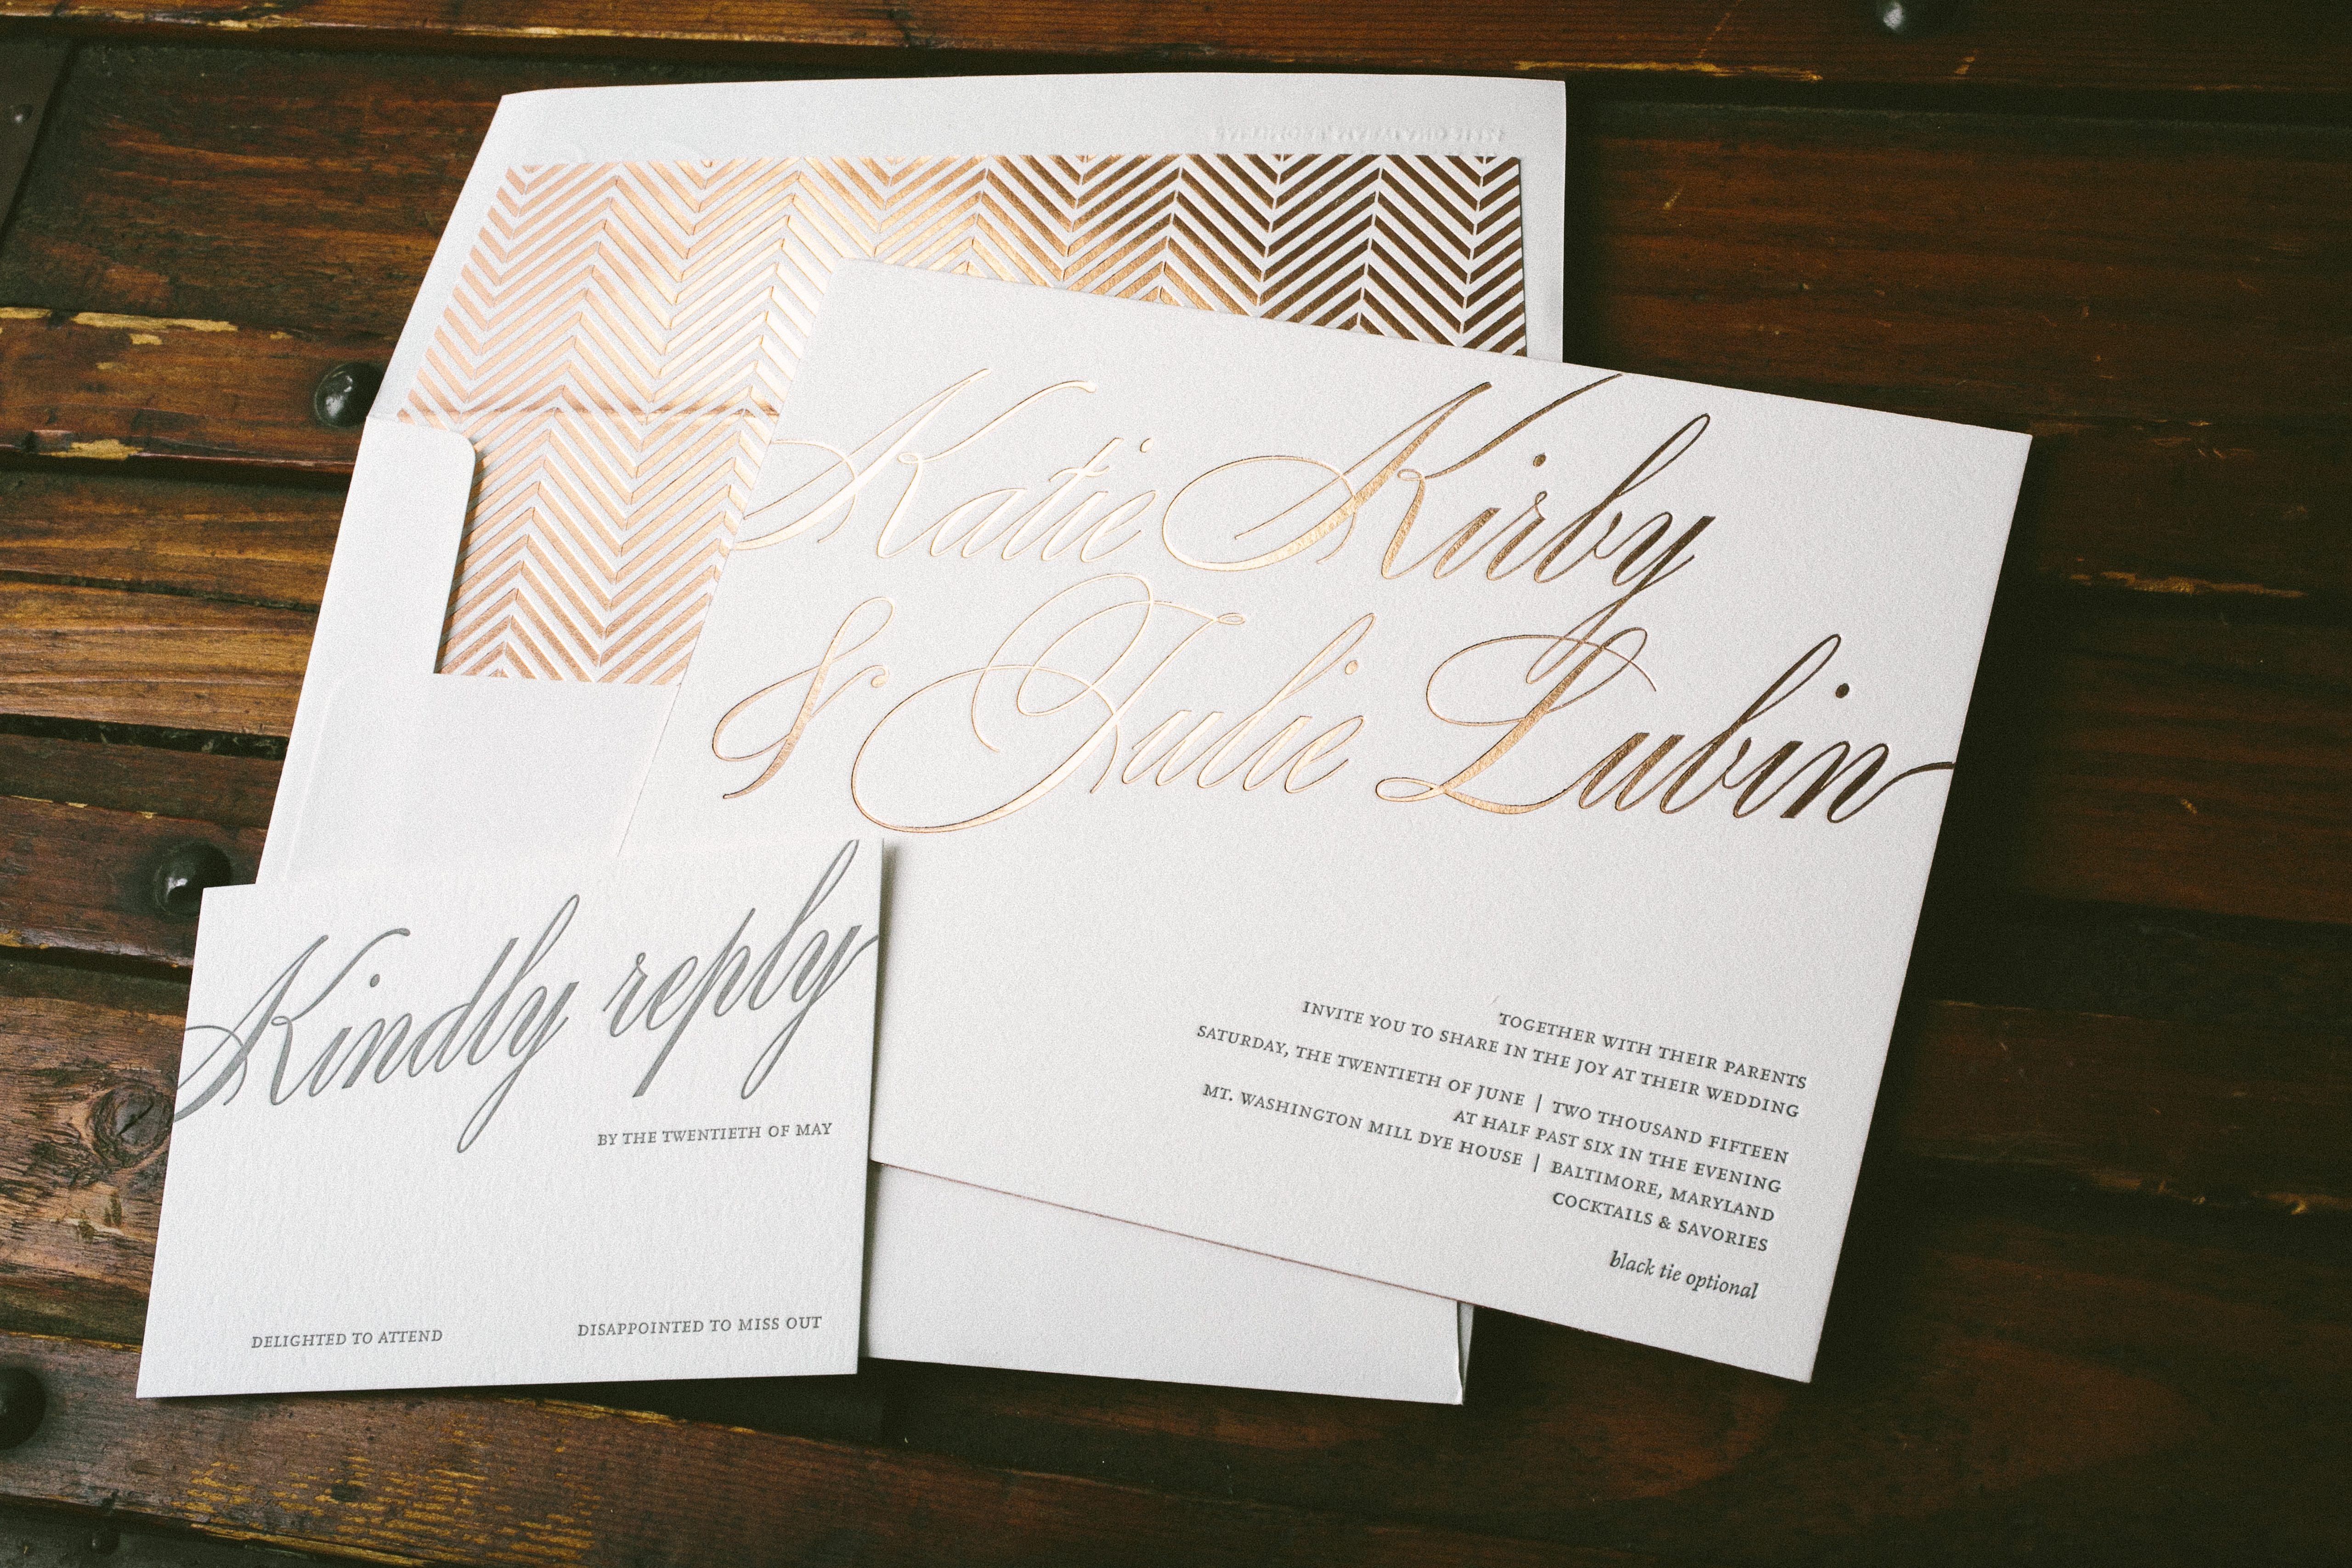 florian script rose gold wedding invitations gold wedding invitations Florian Script rose gold wedding invitations Bella Figura